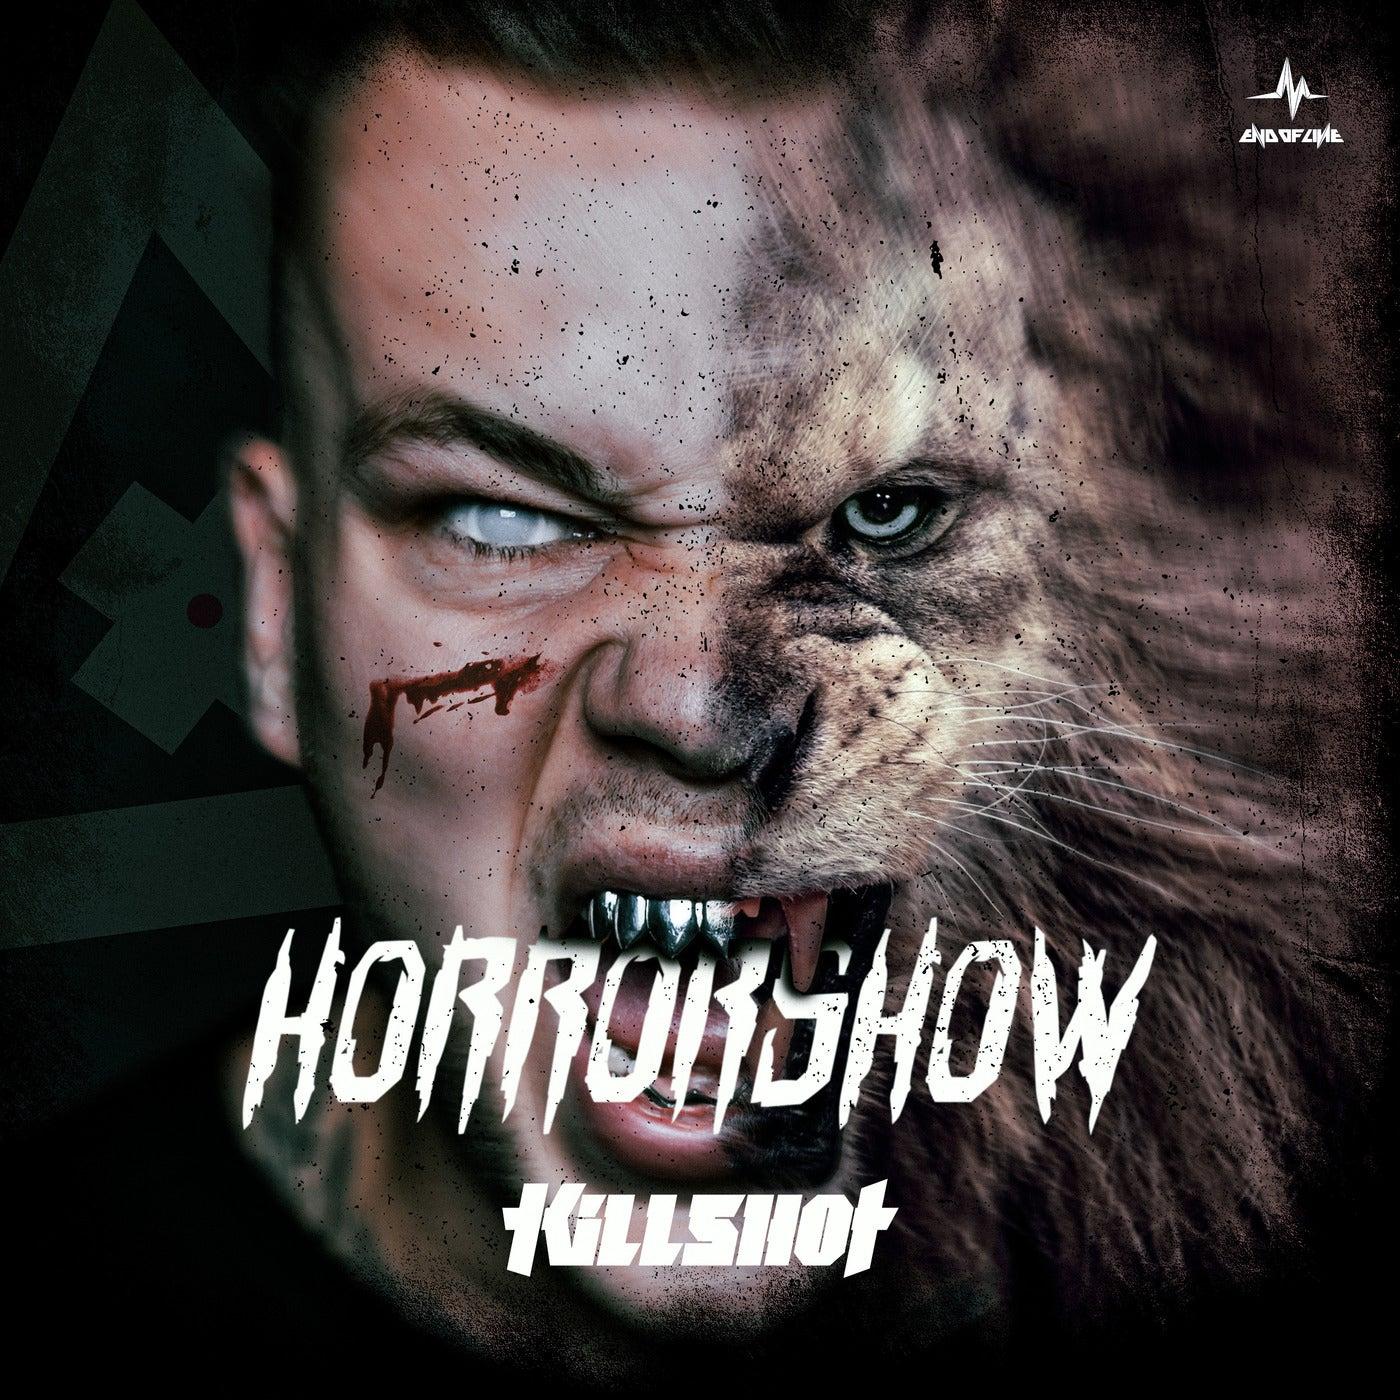 Horrorshow